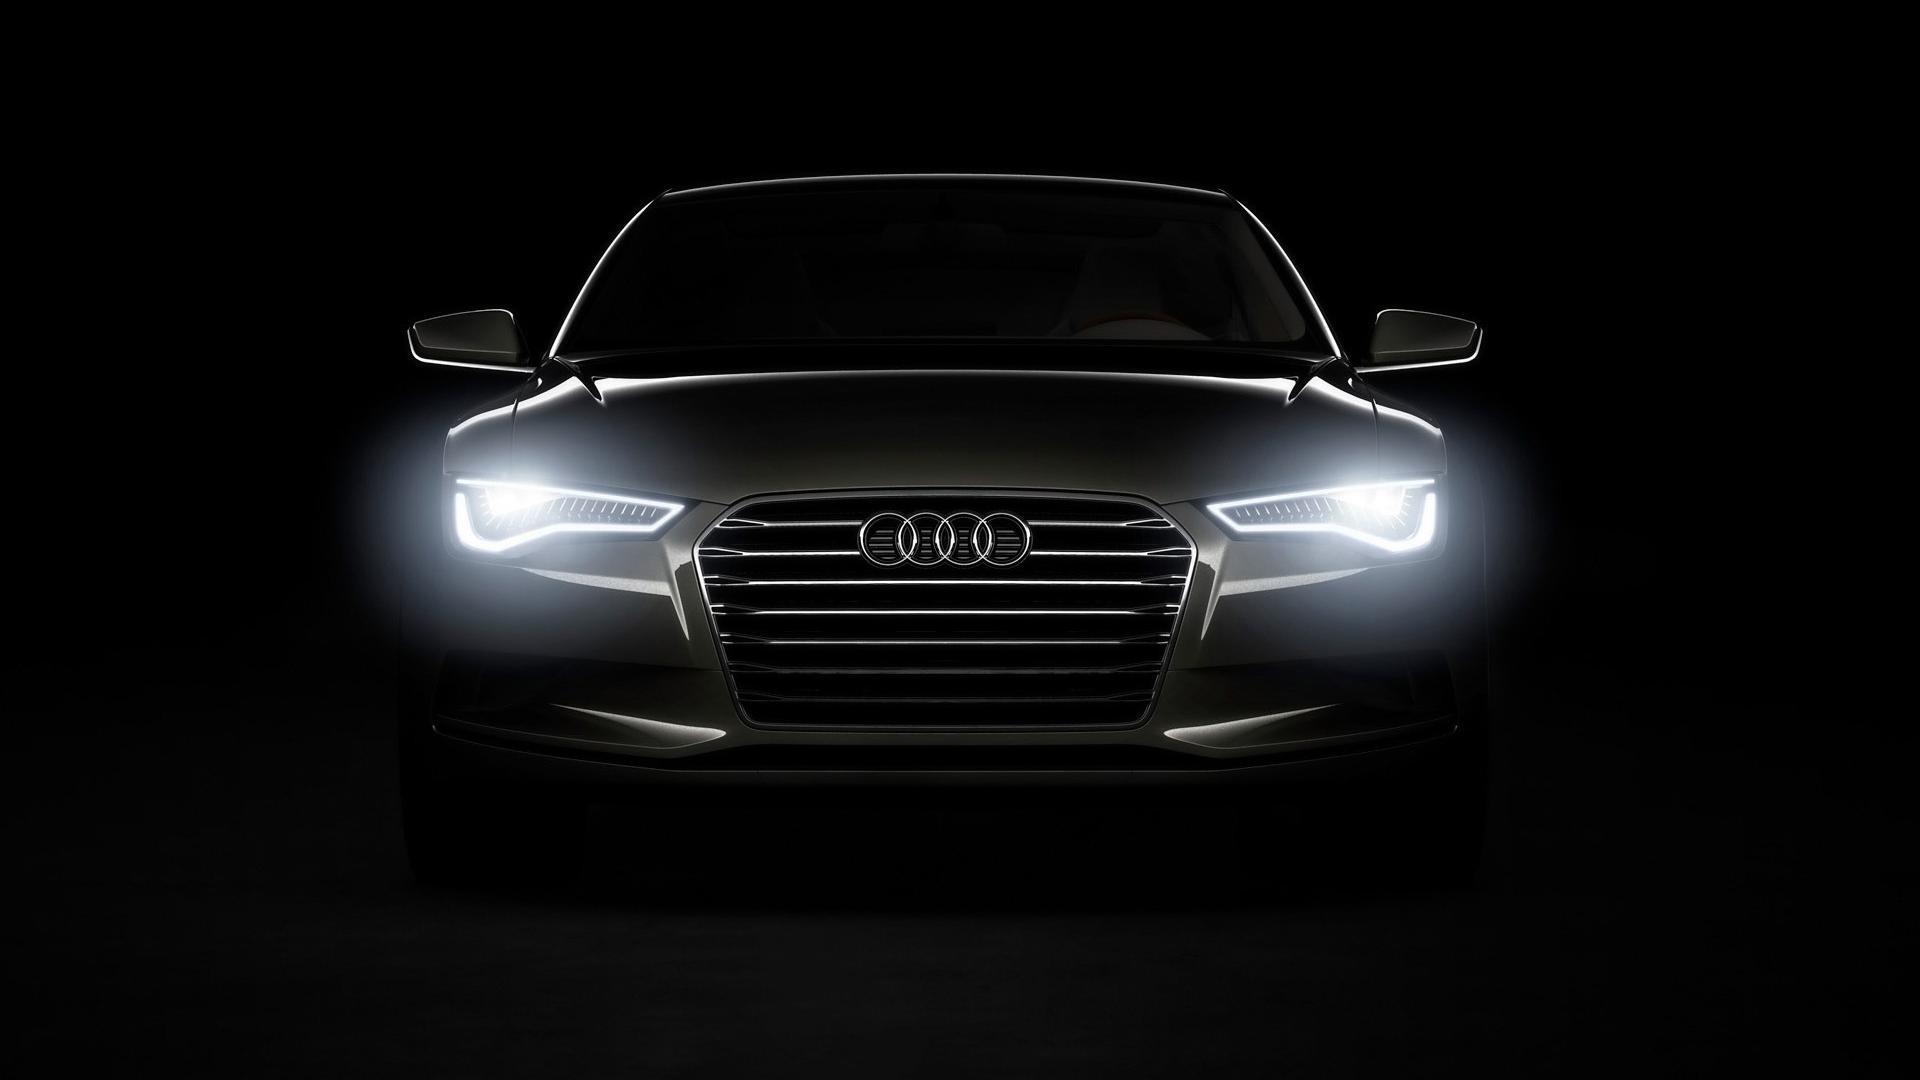 Audi Headlights HD Desktop wallpaper, images and photos